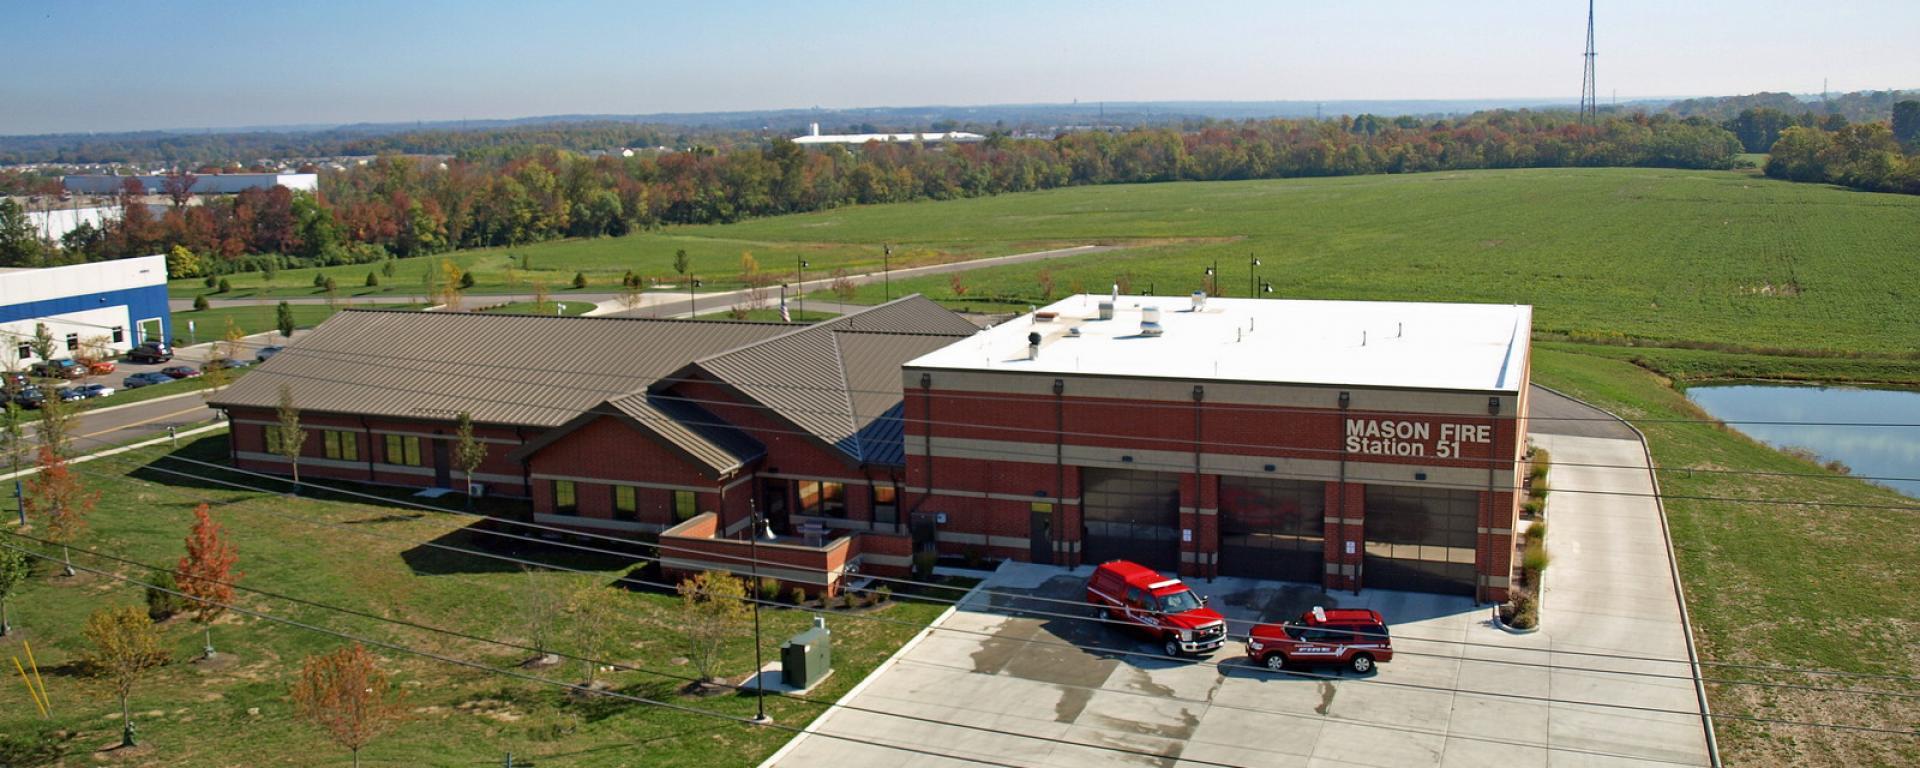 Mason Fire Station 51 | Bayer Becker - Civil Engineers, Land